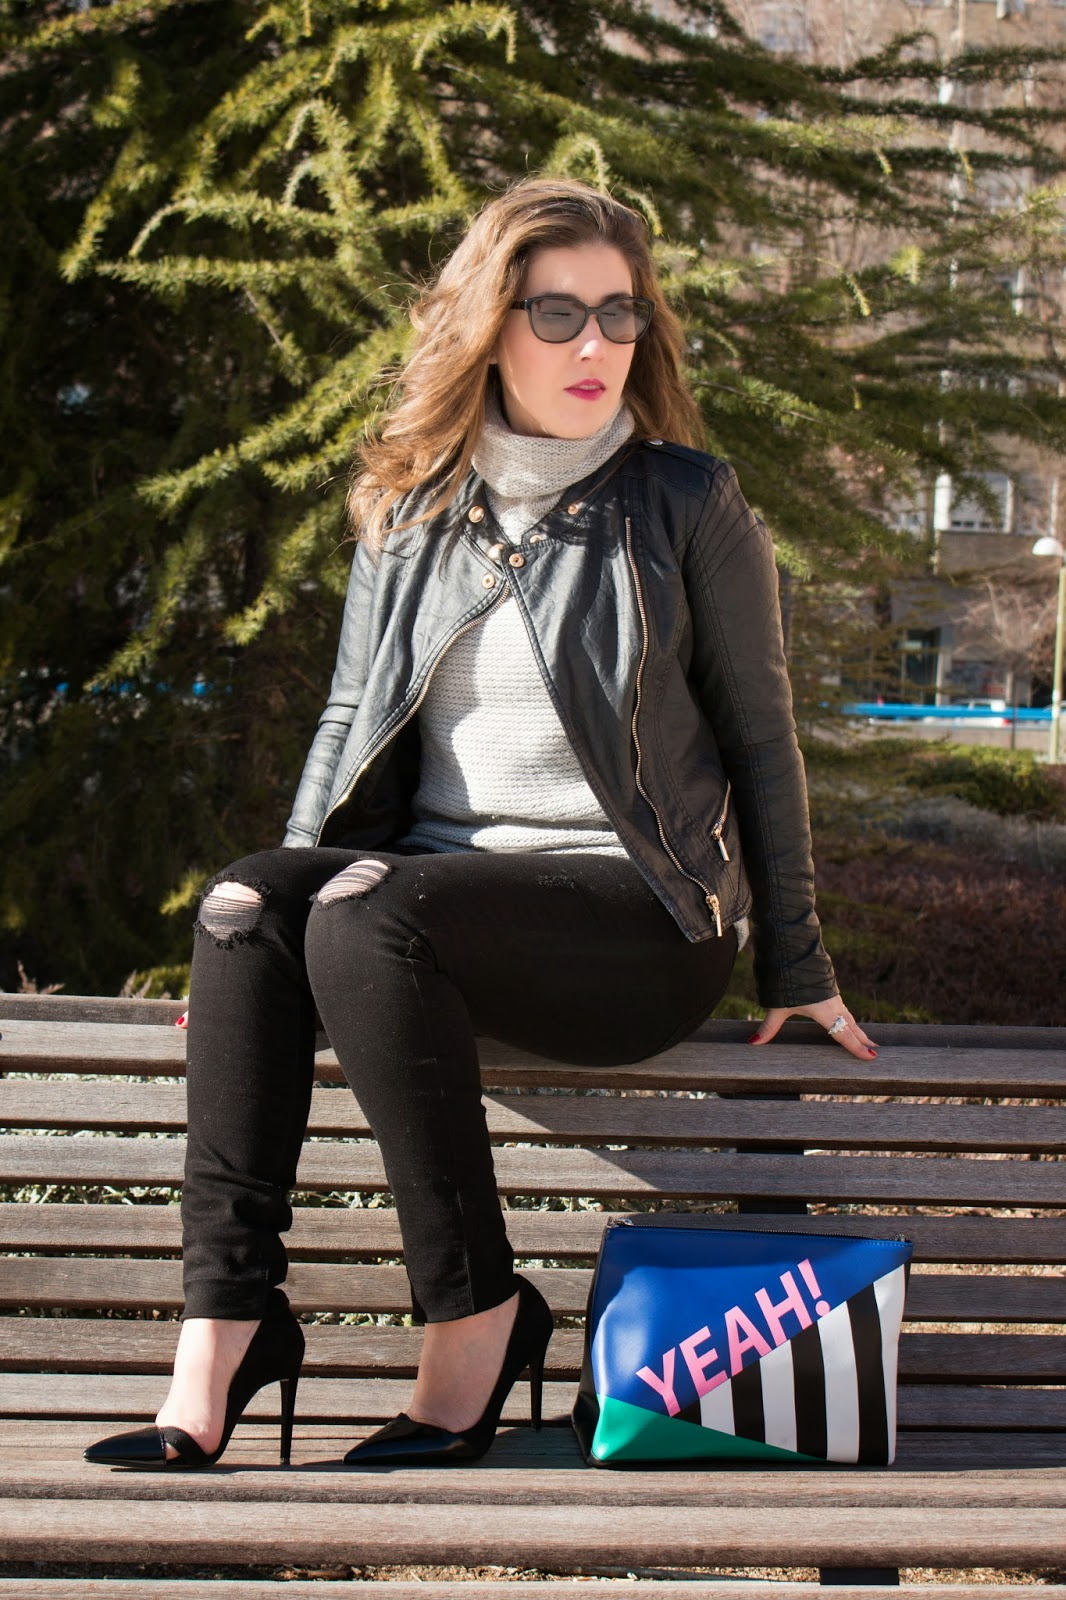 look, Esencia Trendy, ripped jeans, outfit, Asesora de Imagen, Personal Shopper, heels, beauty, luxe, Zara, Bershka, Ralph Lauren, Primark,